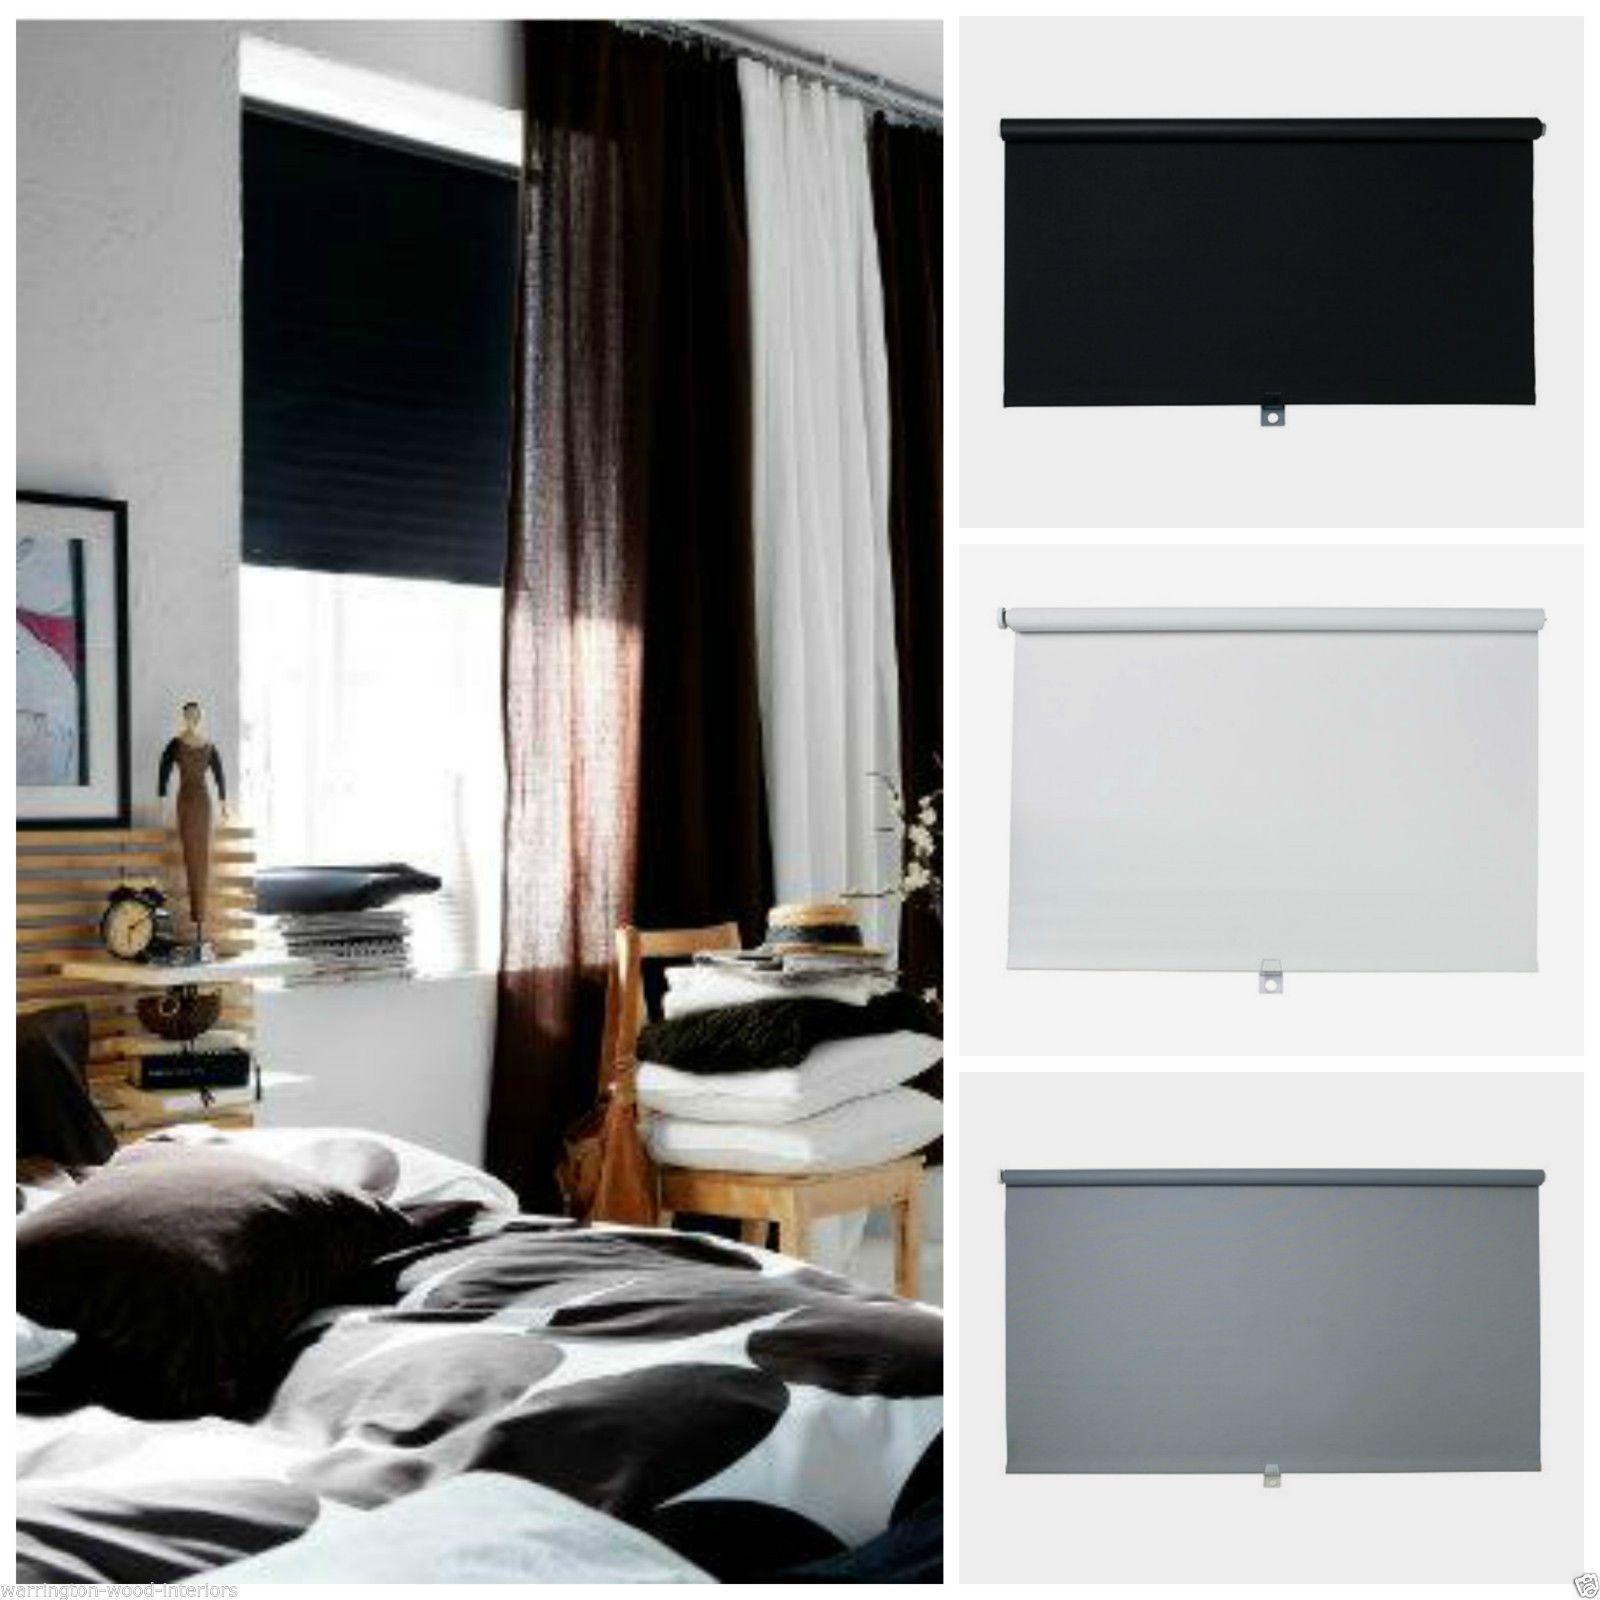 IKEA ★ TUPPLUR ★BLACKOUT BLIND ★ BLACK, WHITE OR GREY